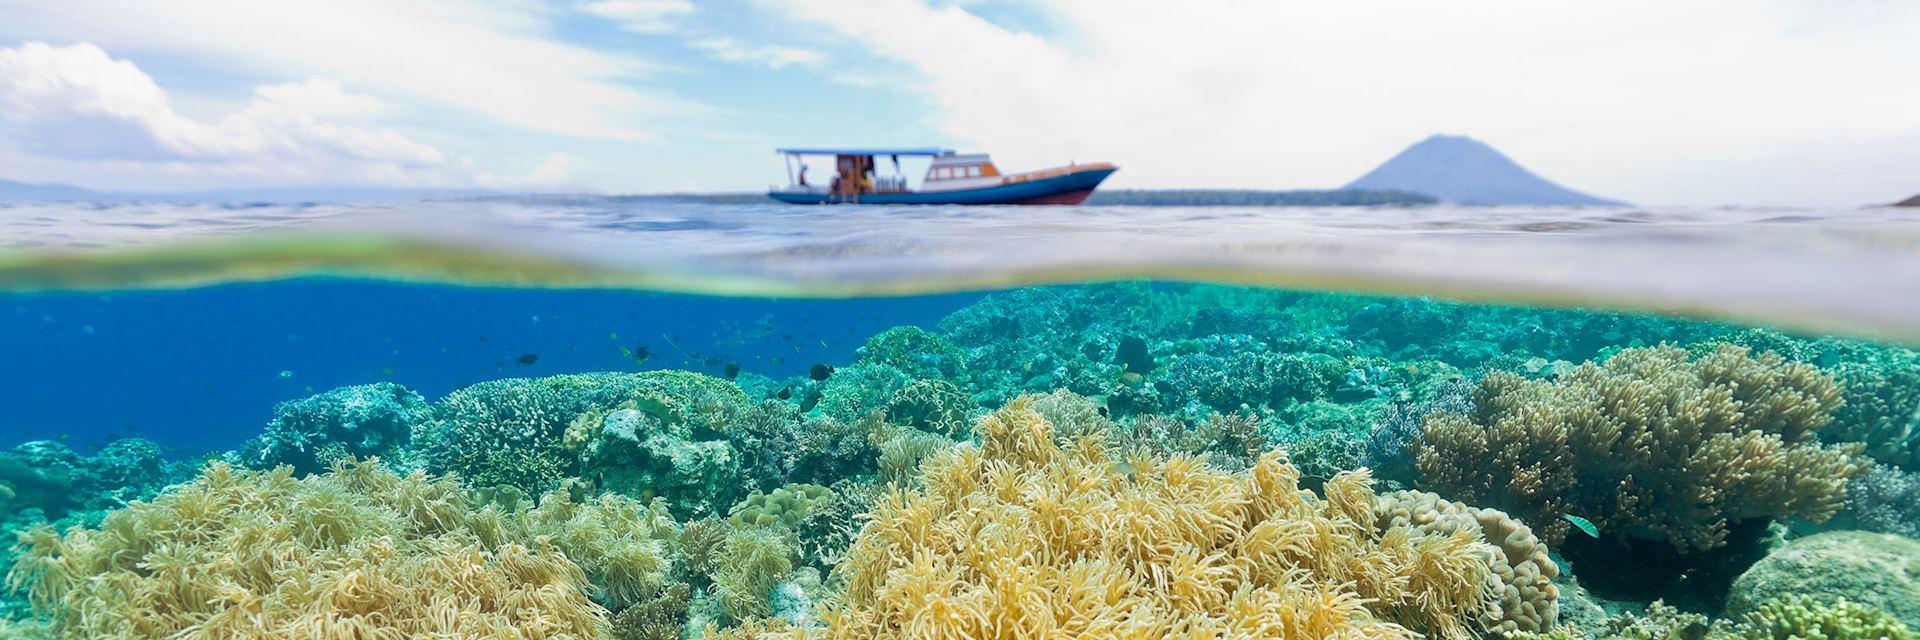 Coral reef in Manado